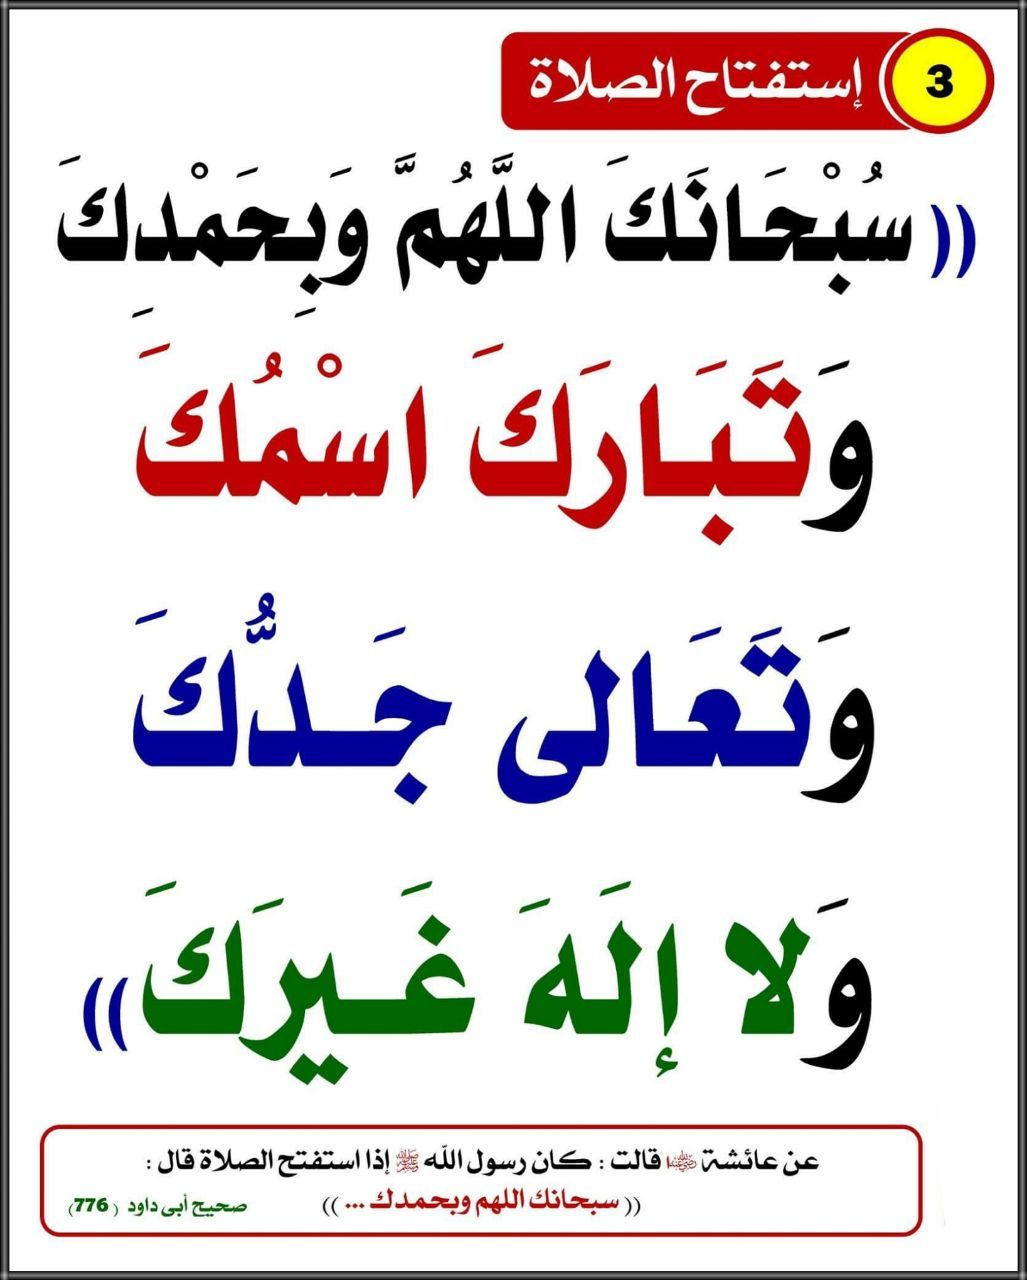 نماز شروع کرنے کے کی دعائے استفتاح Muslim Quotes Islamic Quotes Quotes